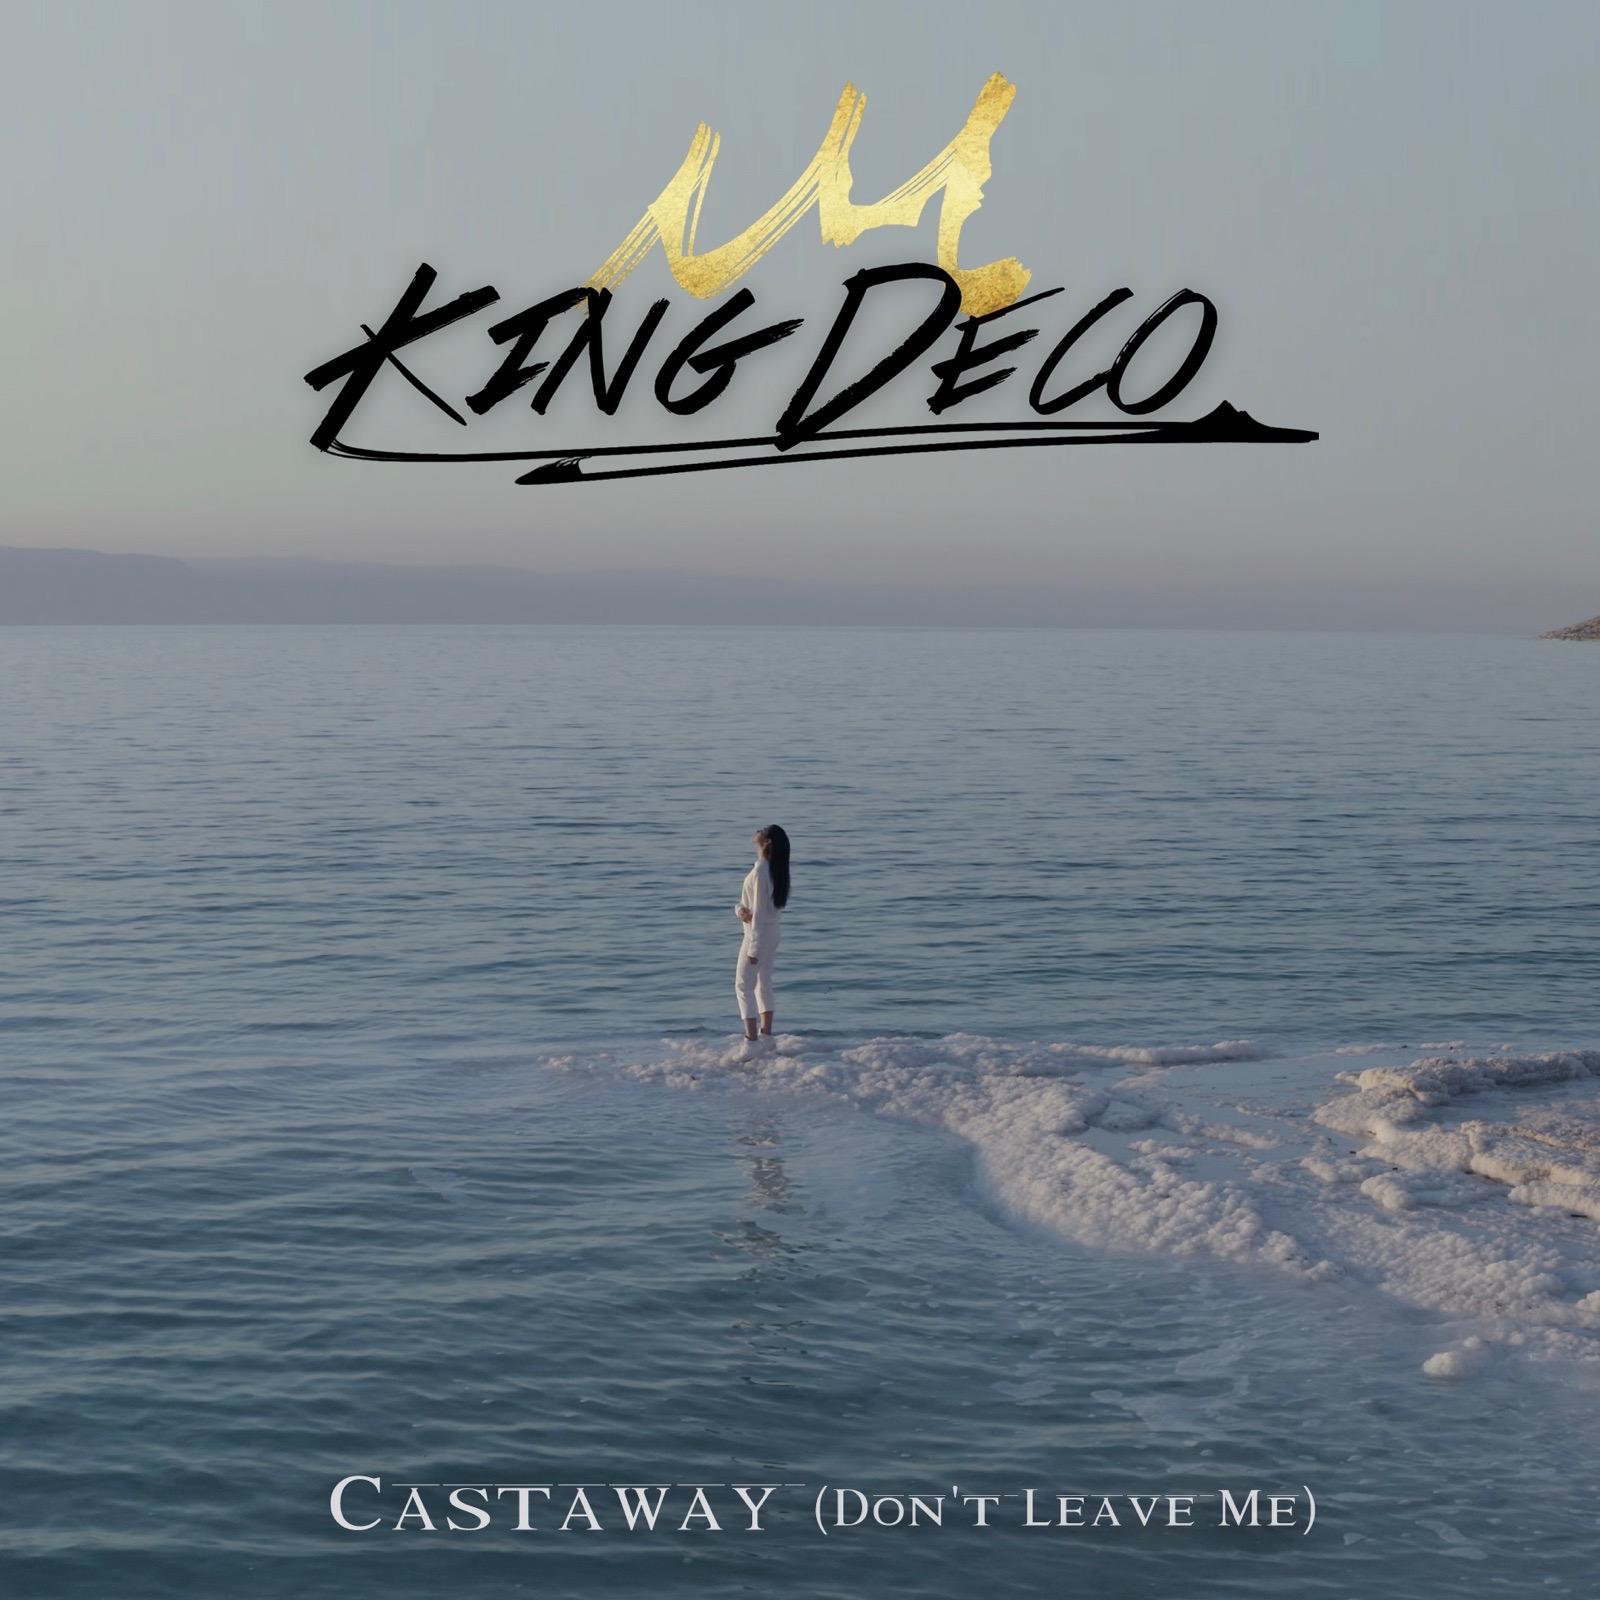 King Deco - Castaway (Don't Leave Me)